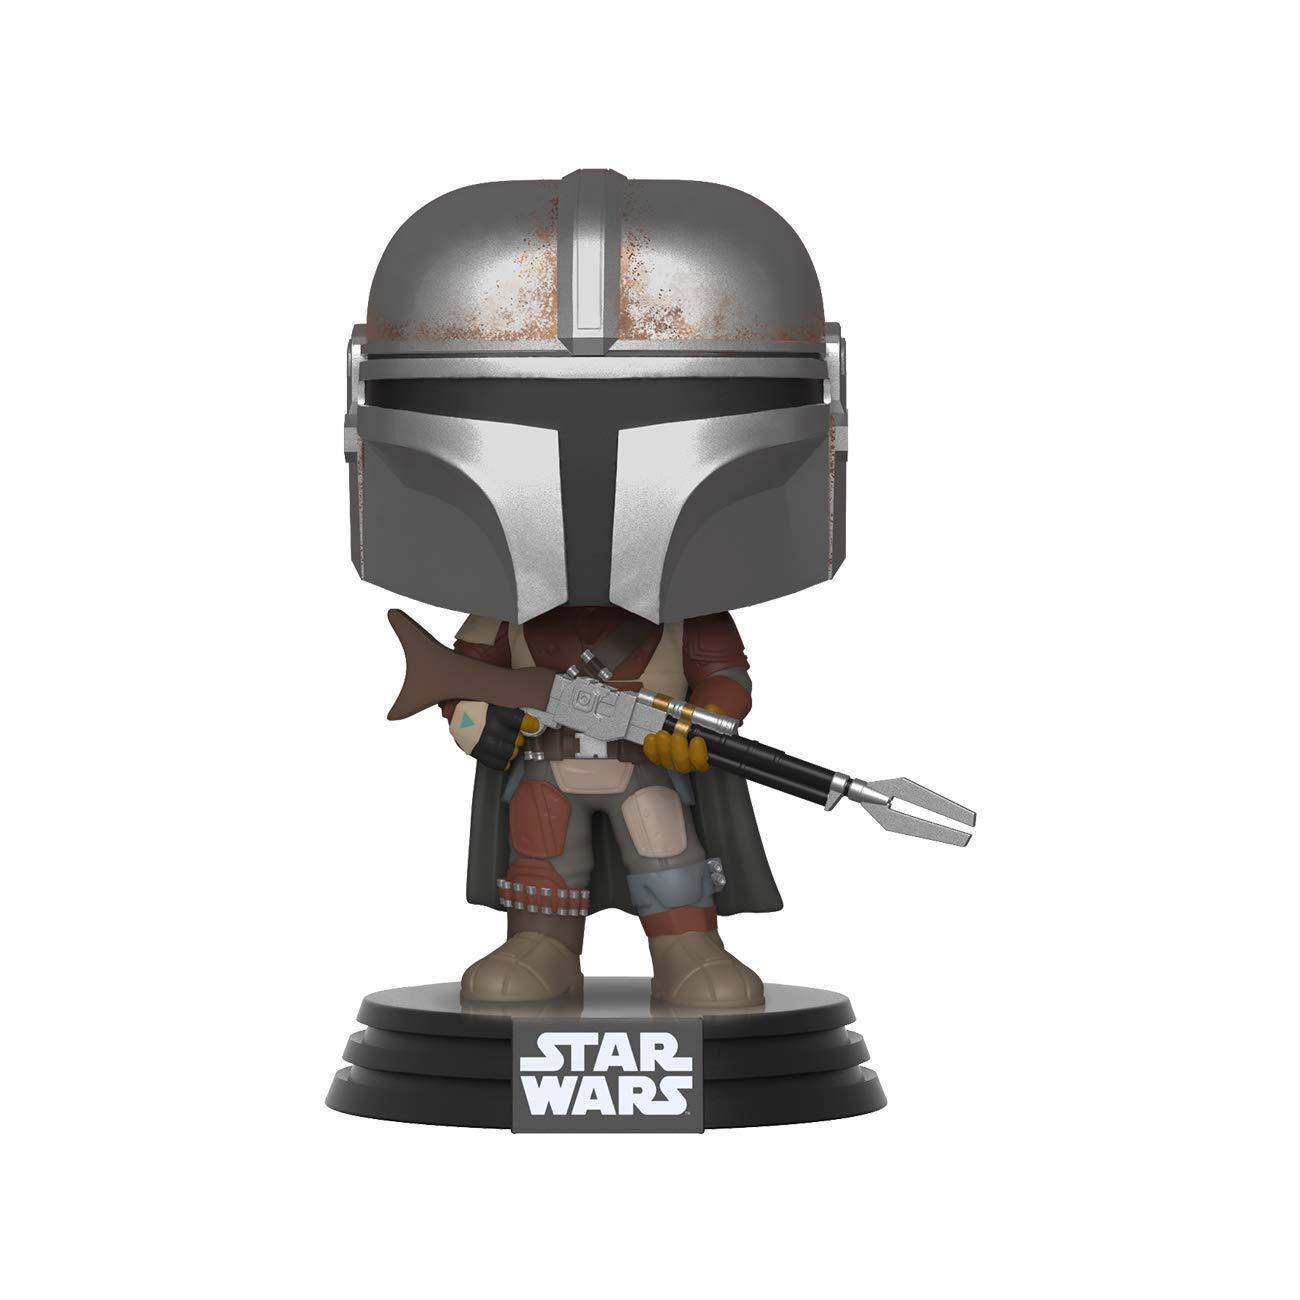 Funko Pop! Star Wars: Mandalorian - The Mandalorian, Bobble-Head, 3.75 inches @ Amazon & Walmart $8.78+tx